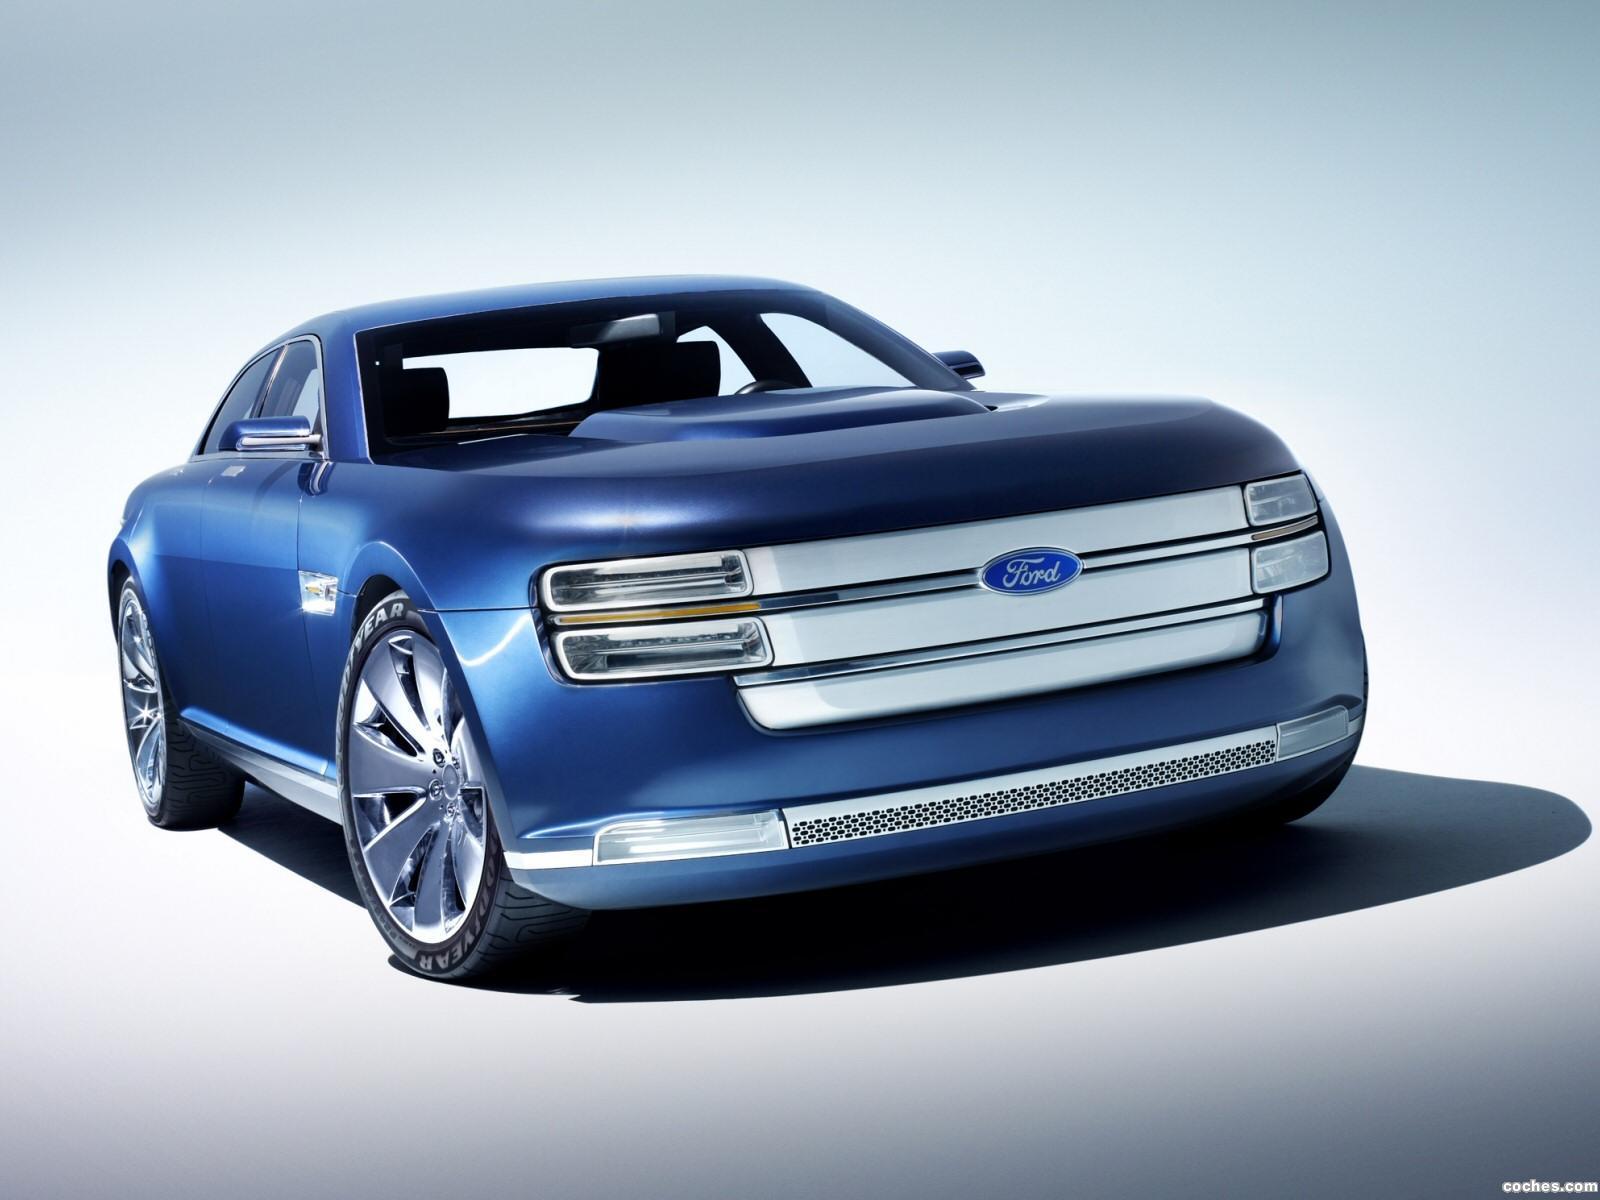 Foto 4 de Ford Interceptor Concept 2007